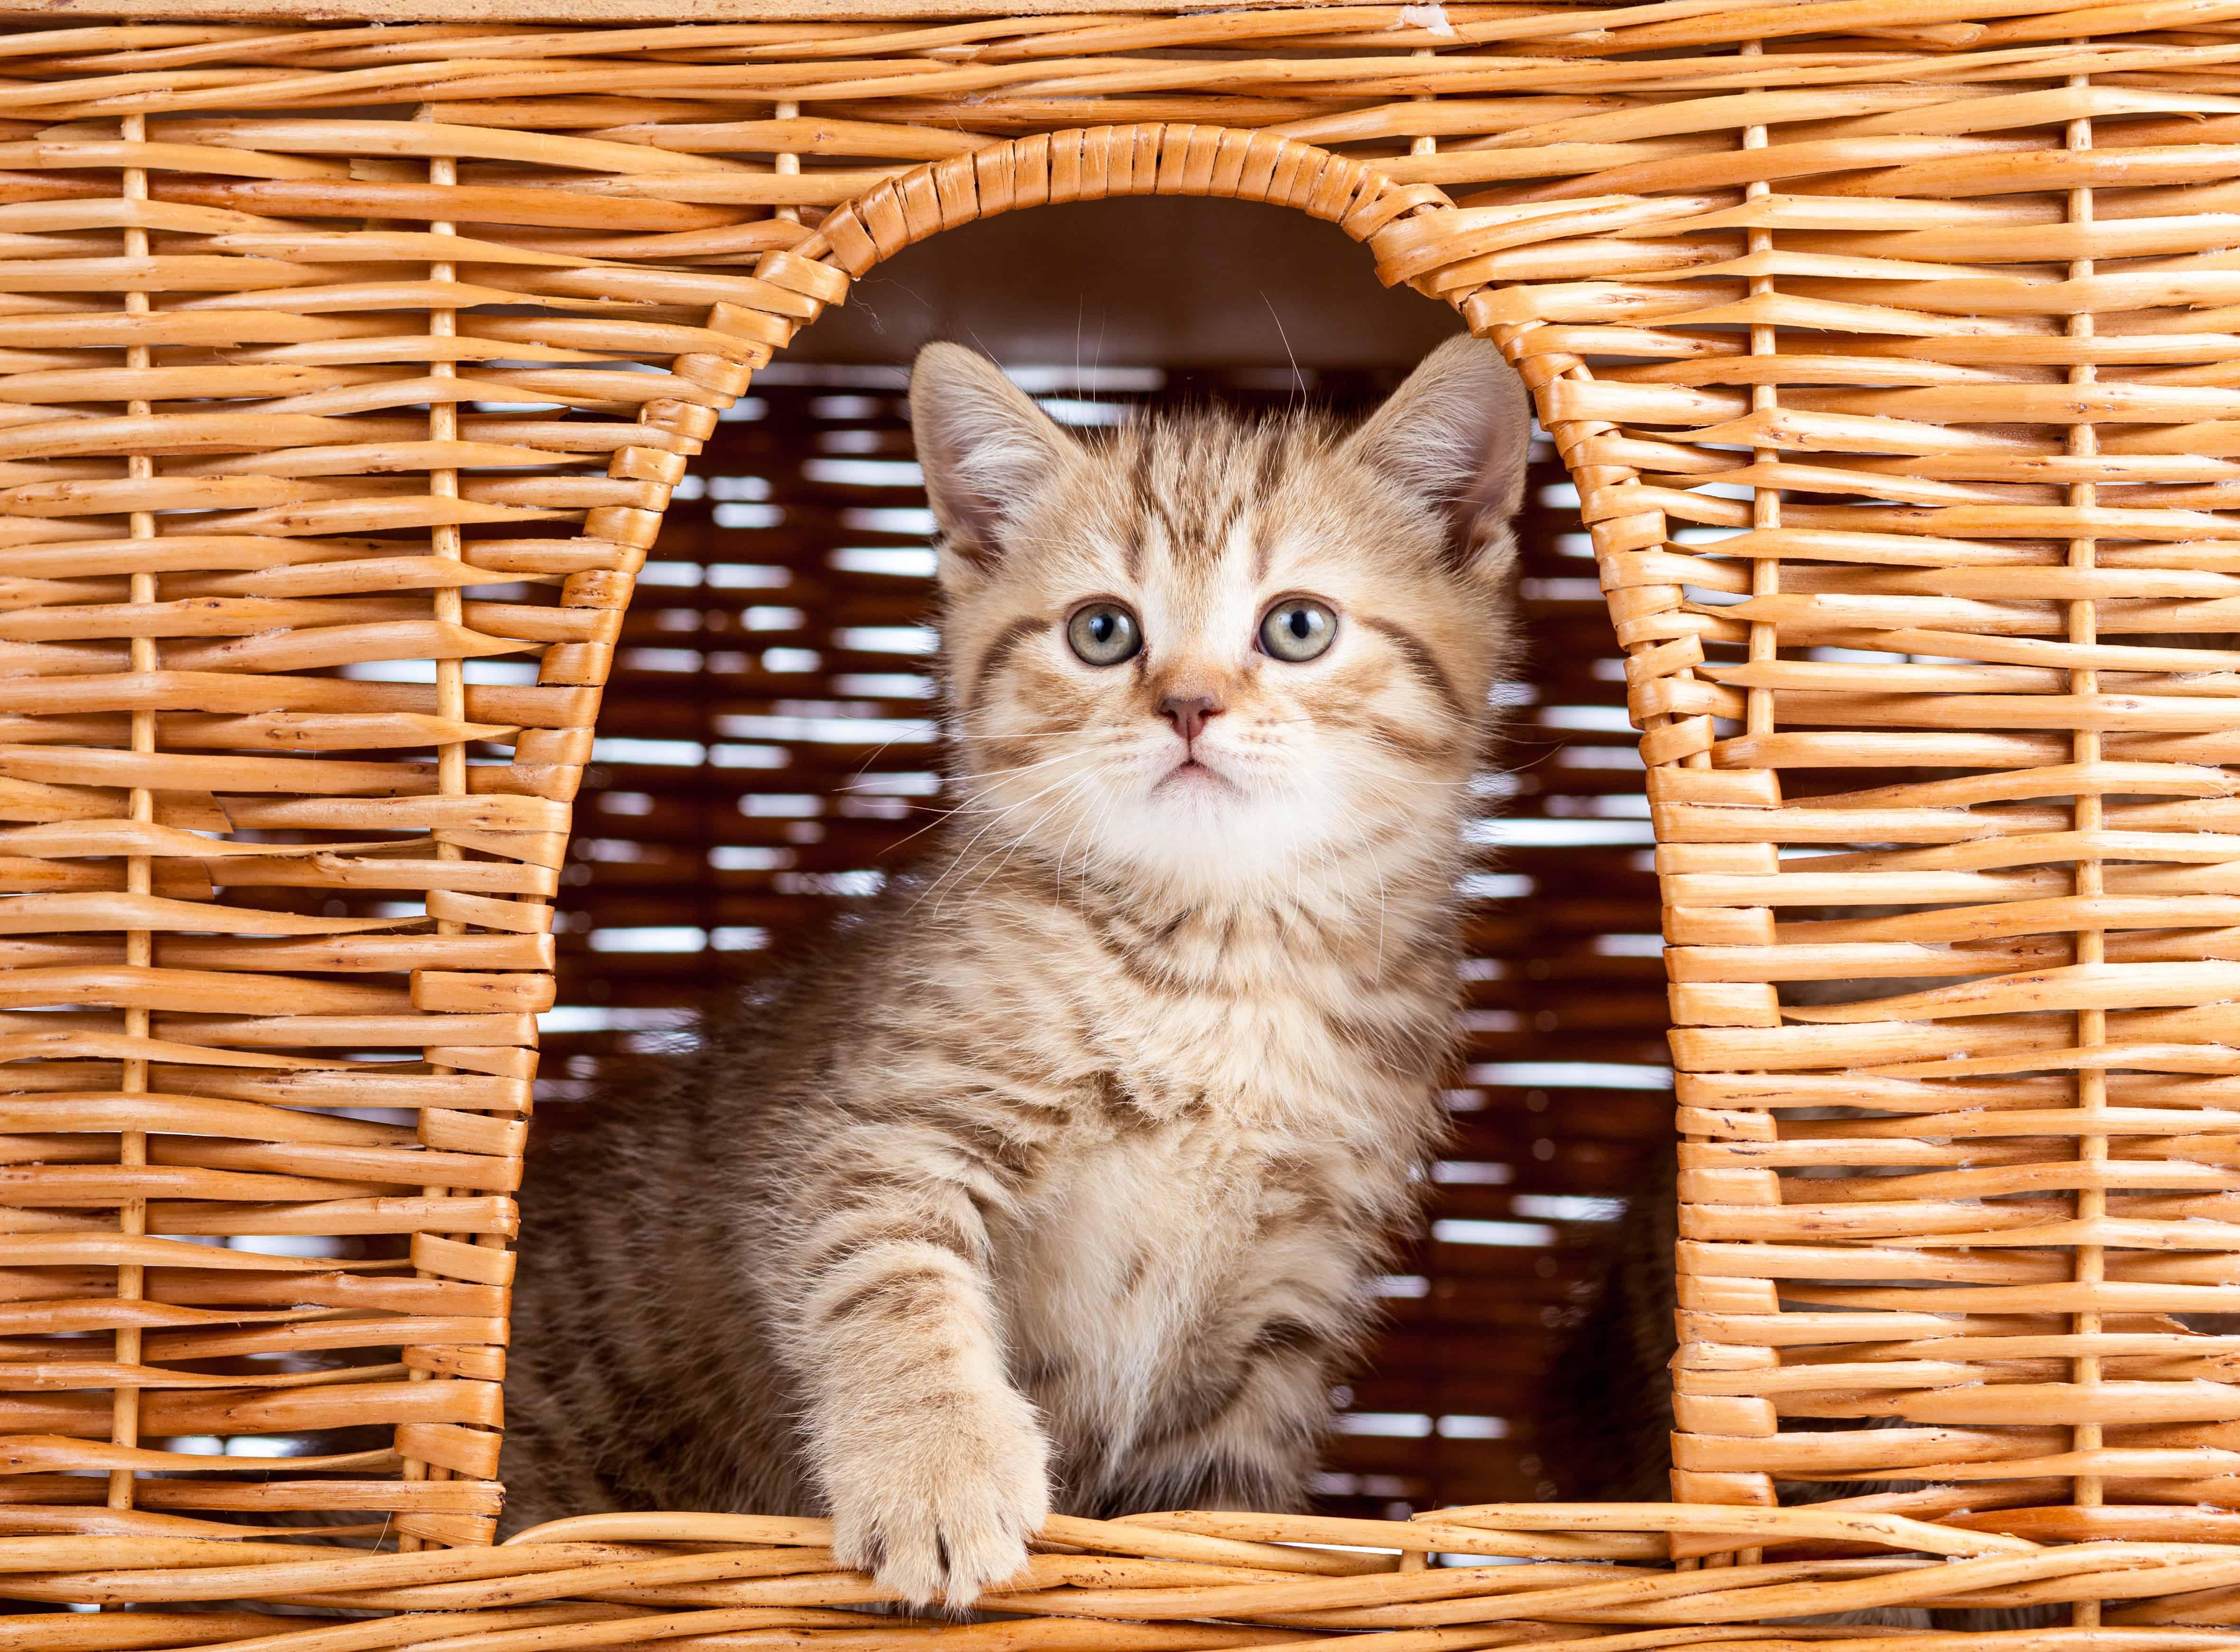 Gattino in una casetta